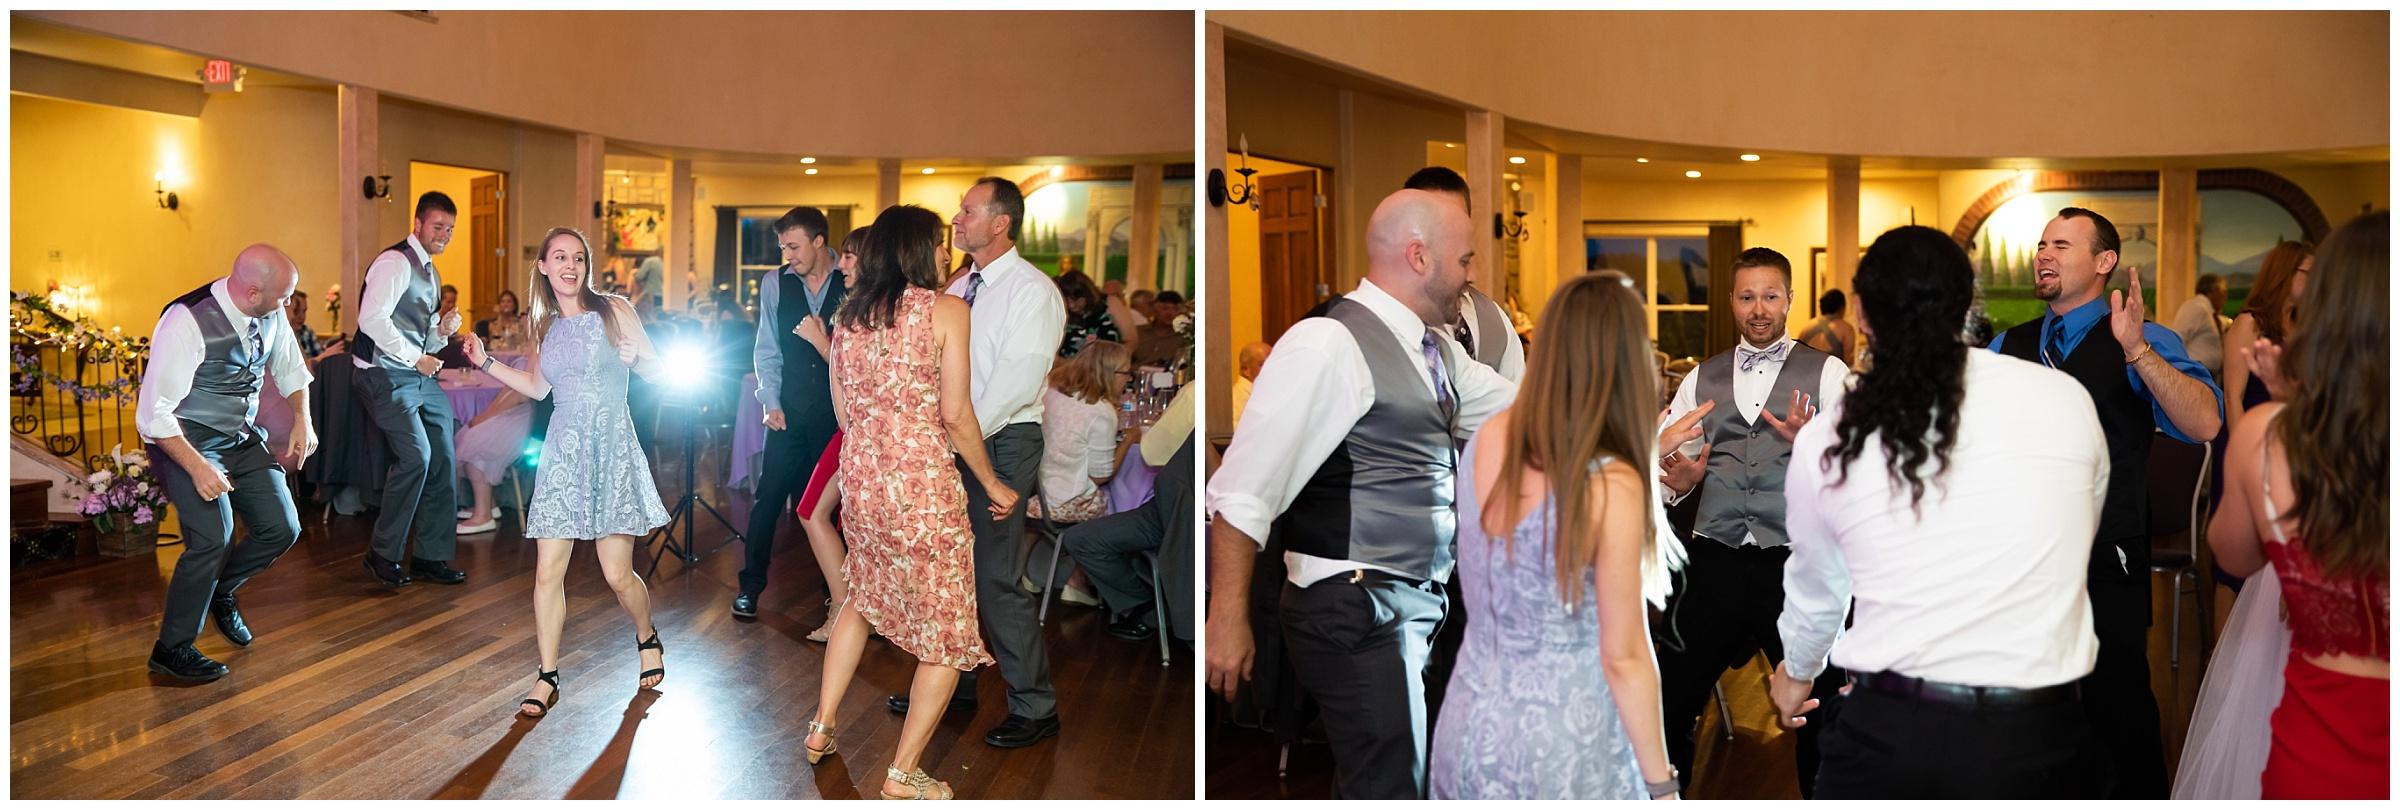 Grand Junction Wedding Photographer 0070.jpg